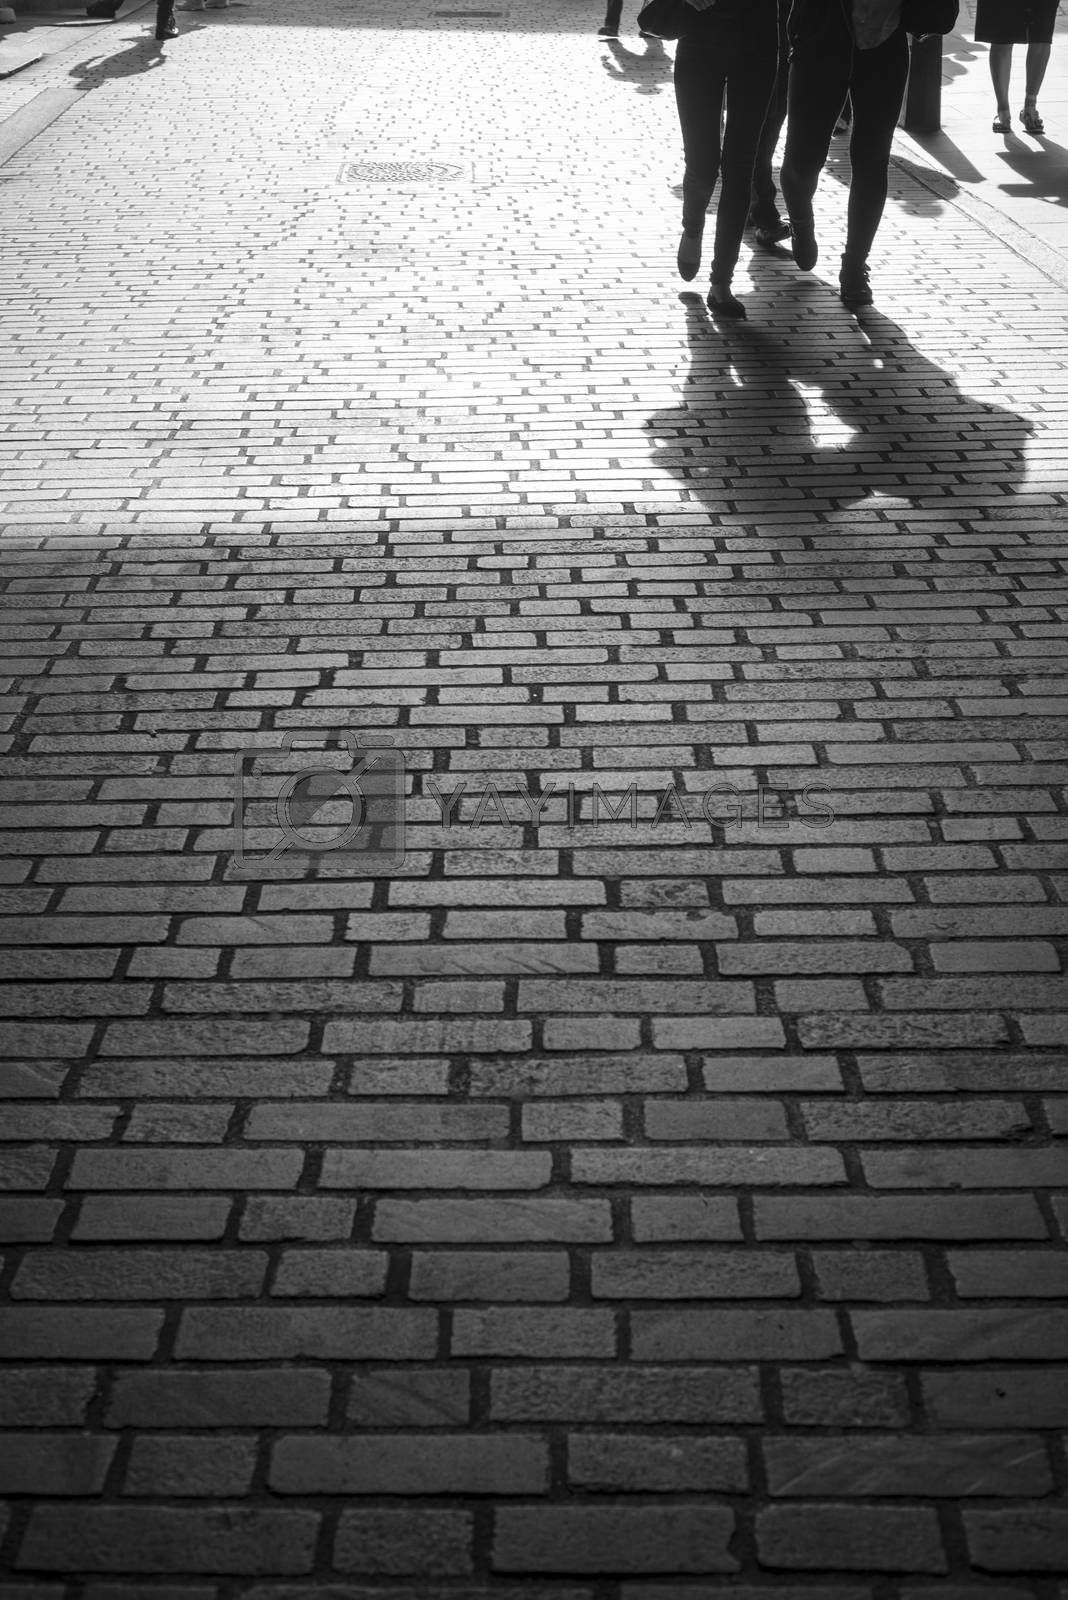 commuters walking down a cobbled lane in london city